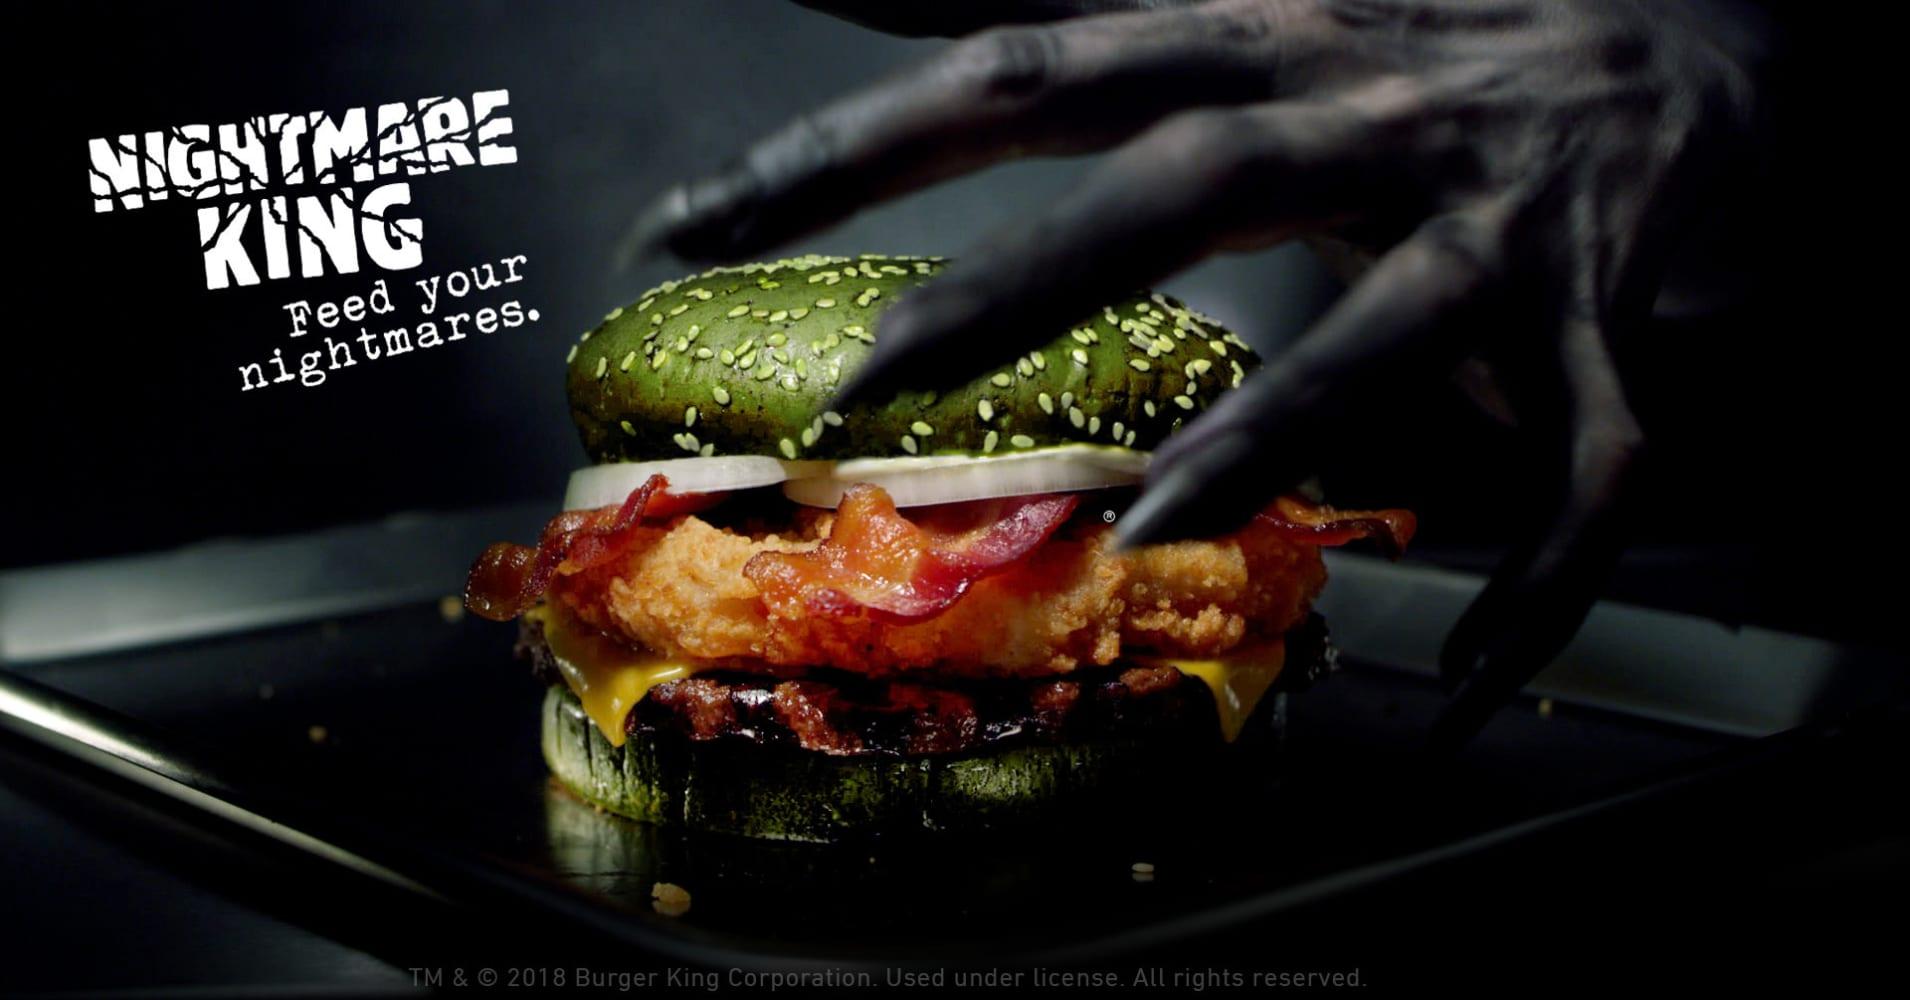 Burger king dating policy